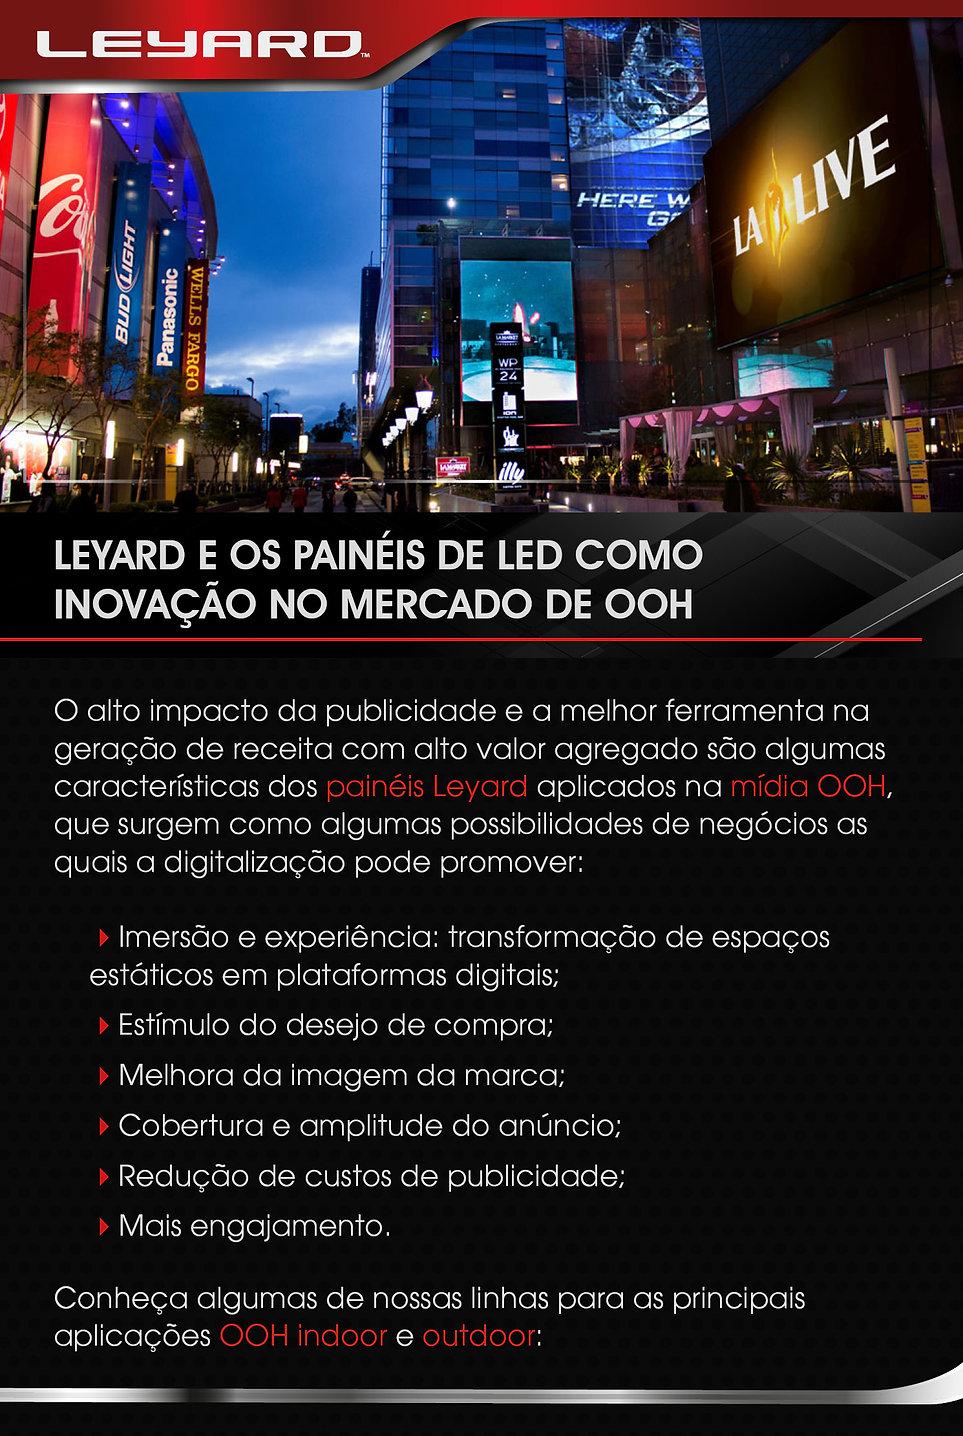 leyard-catalogo-ooh3.jpg